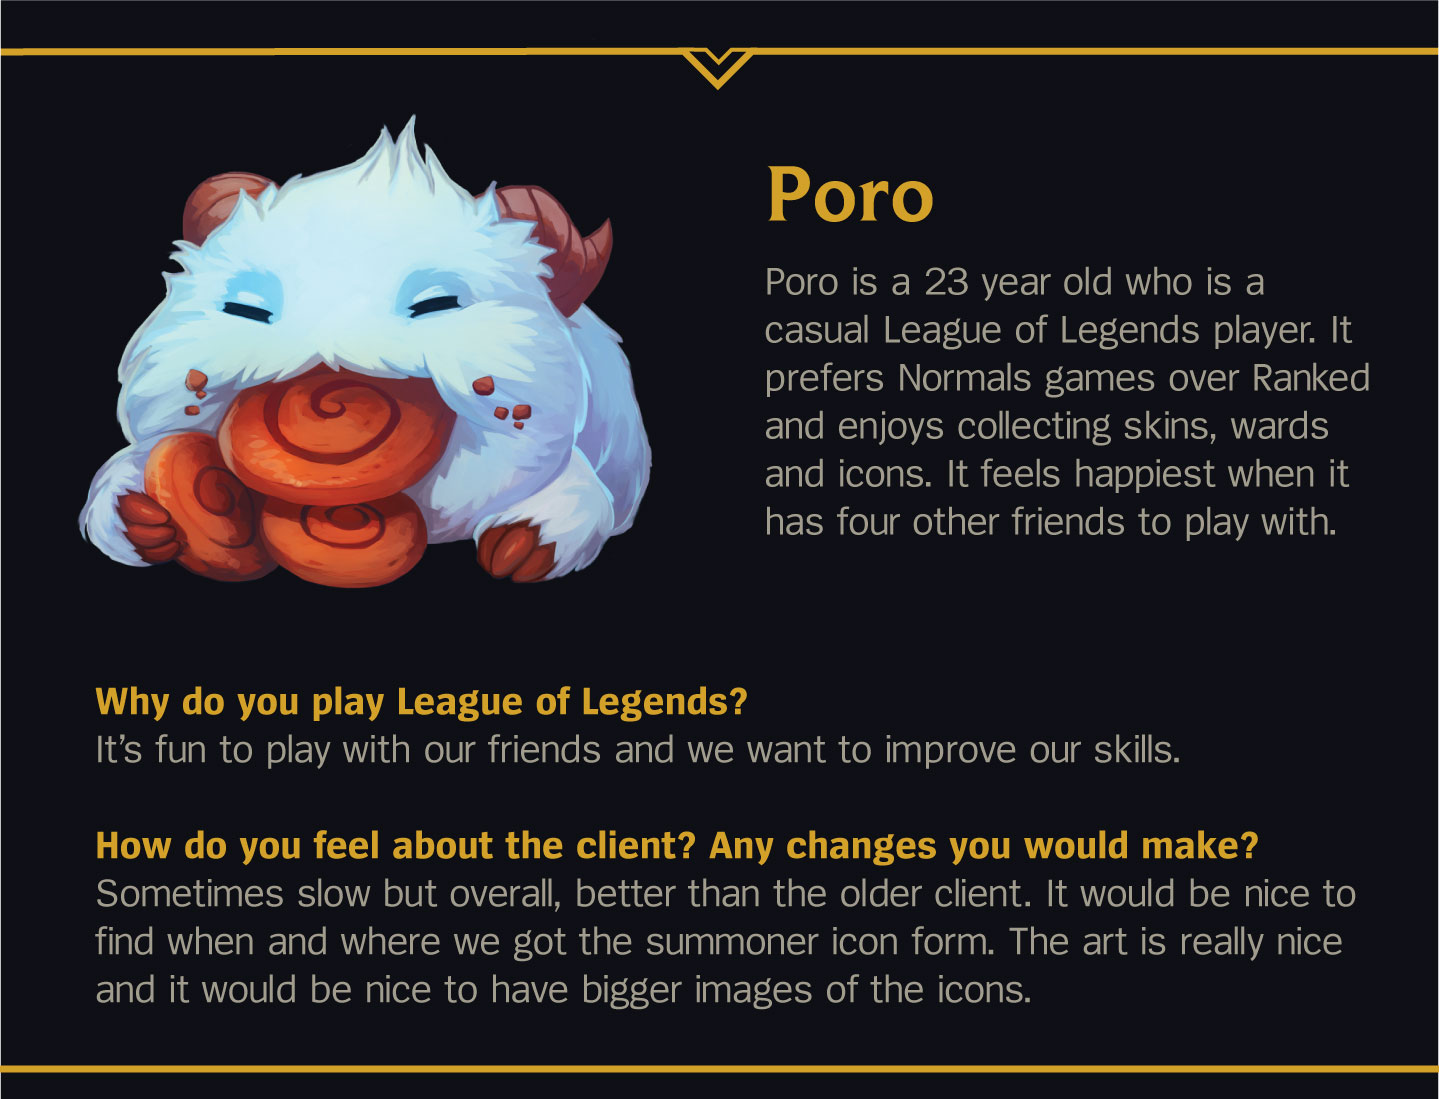 Poro illustration from Riot Games